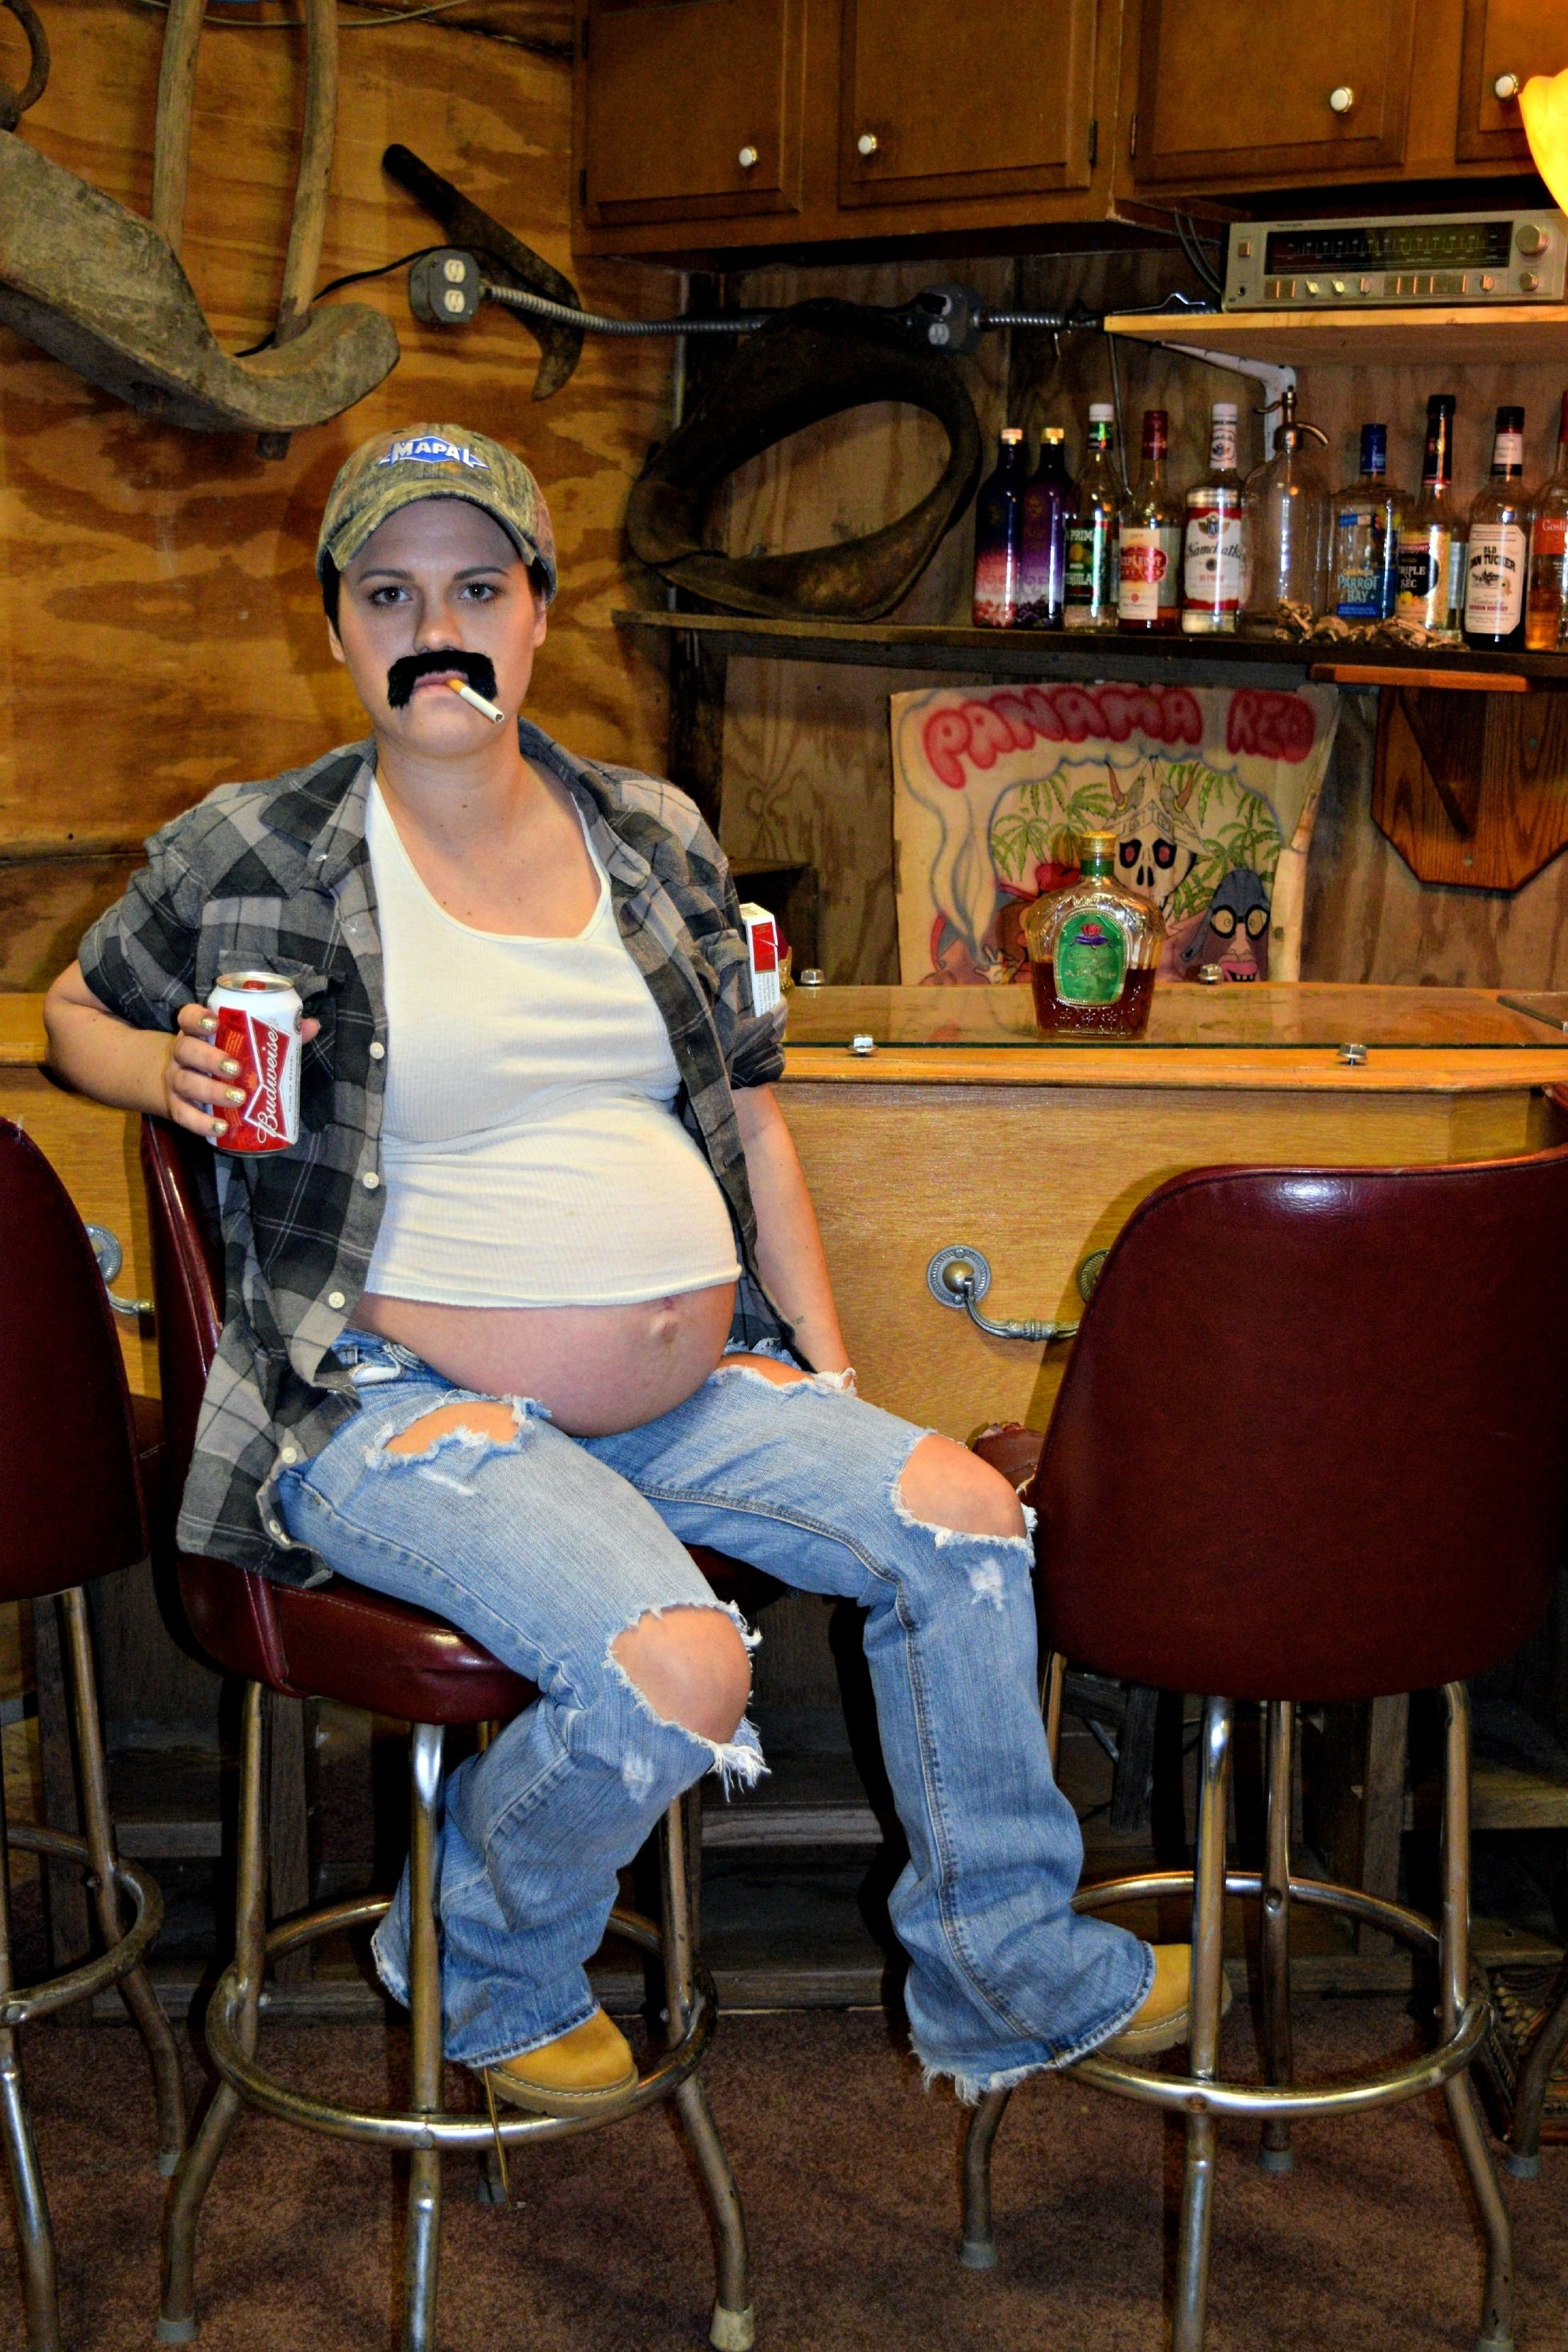 10 Fabulous Funny Pregnant Halloween Costume Ideas maternity halloween costume idea beer belly redneck pregnant 2020